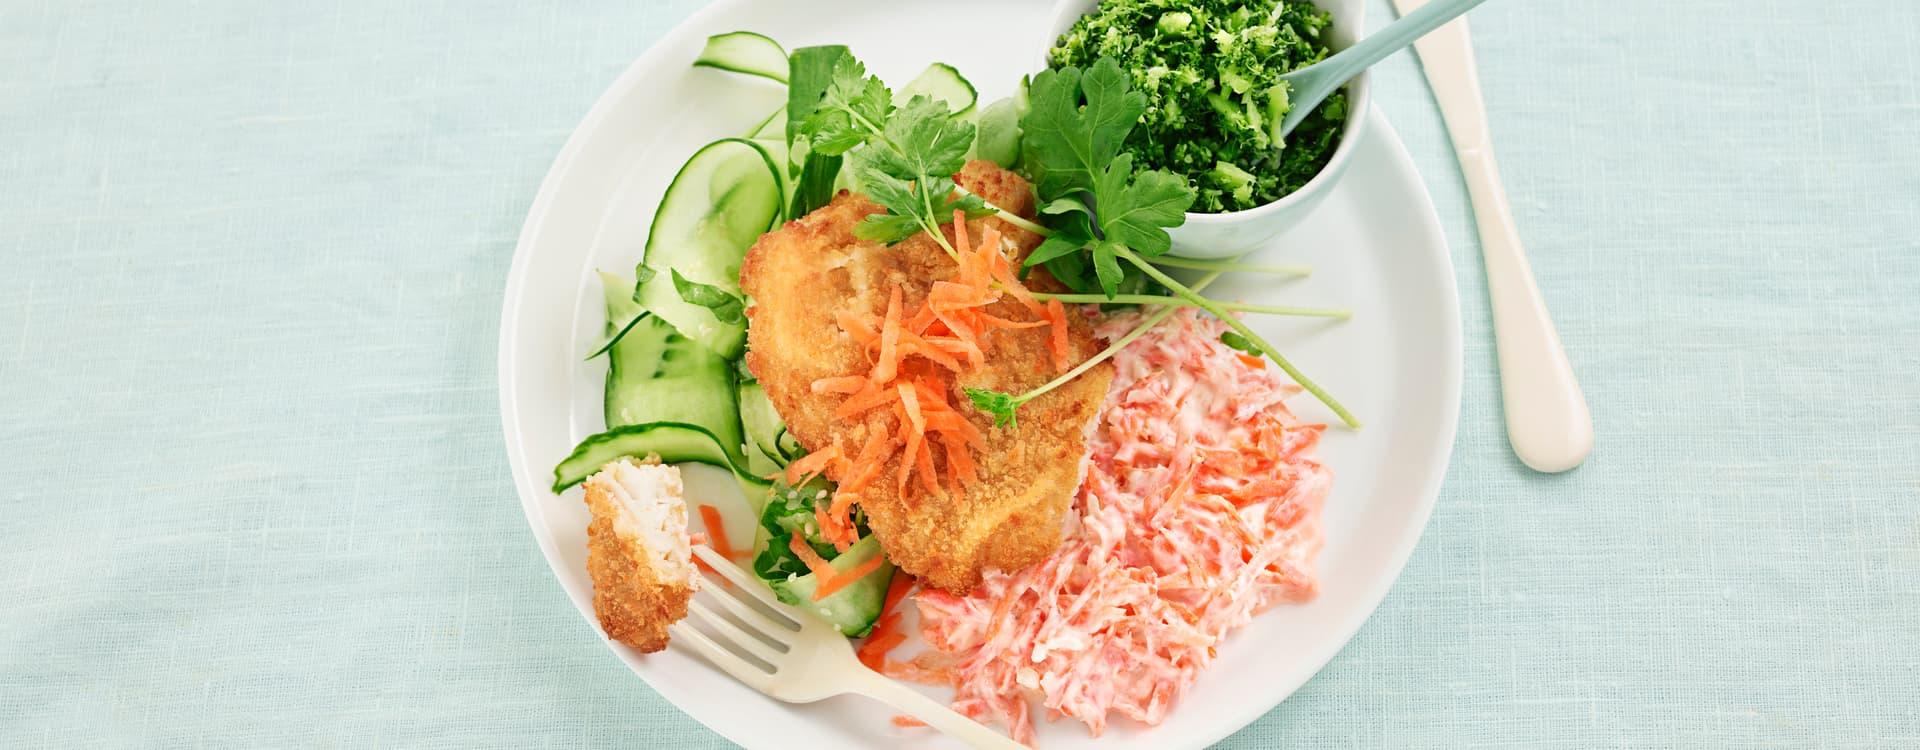 Pankopanert torskefilet med gulrottzatziki og brokkolimos